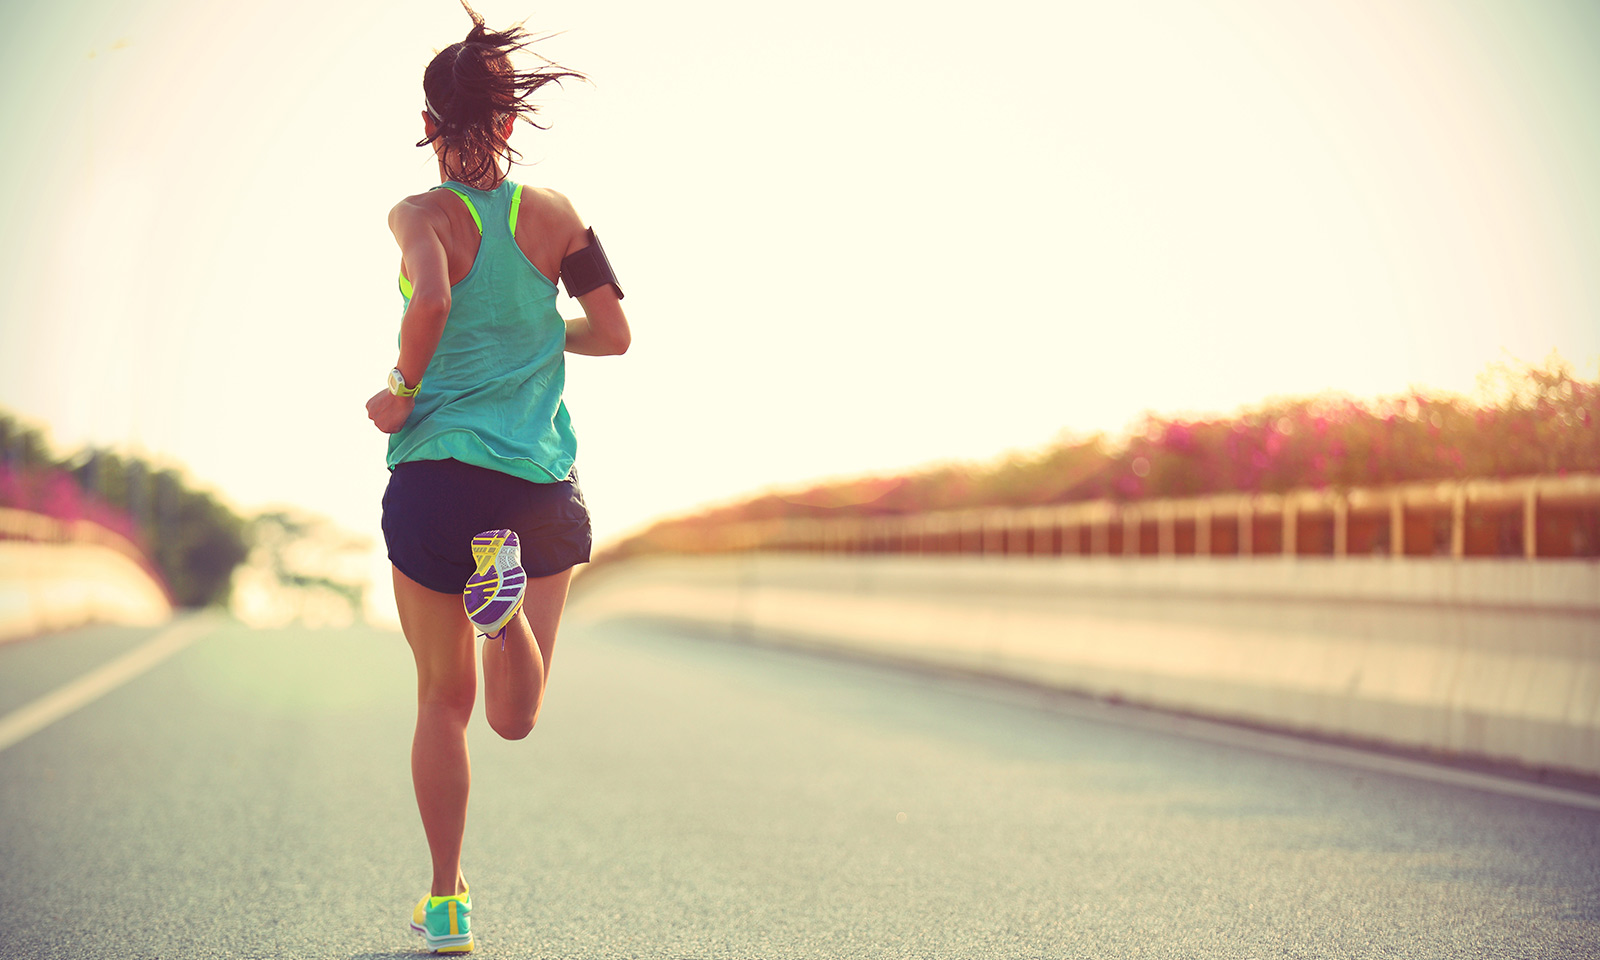 Handy-tips-for-new-runners